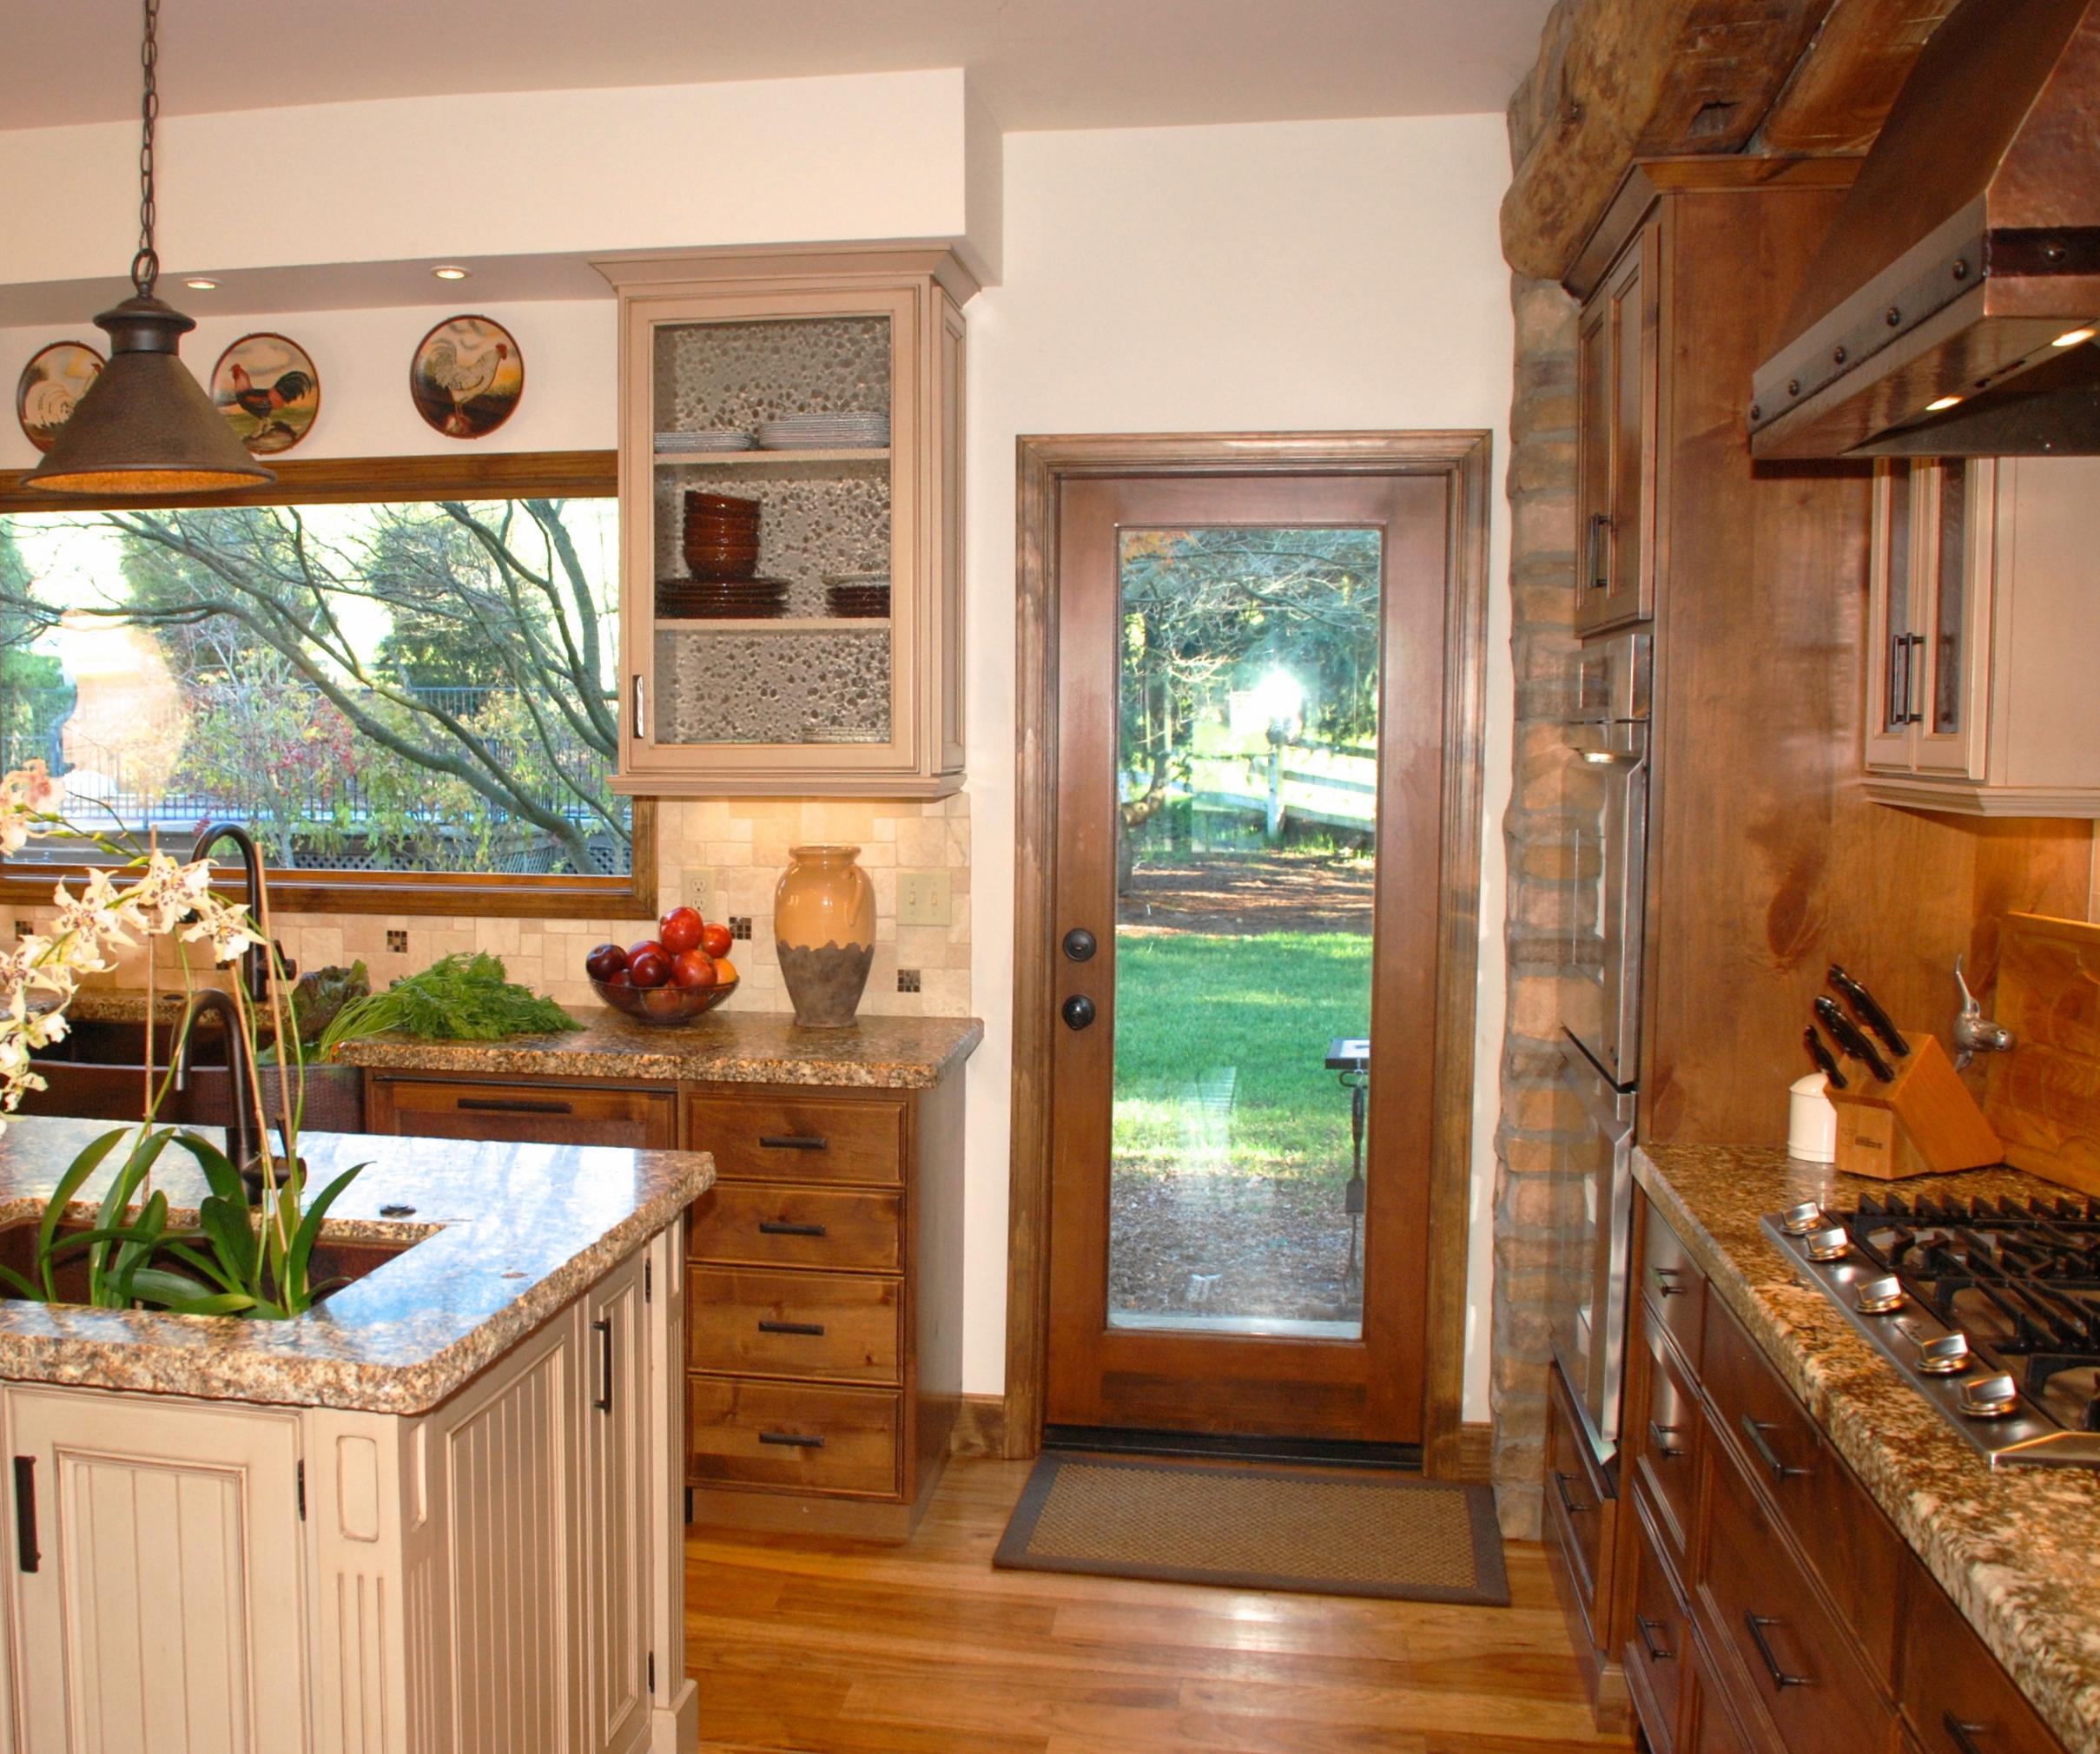 kitchen back door window and stone surround